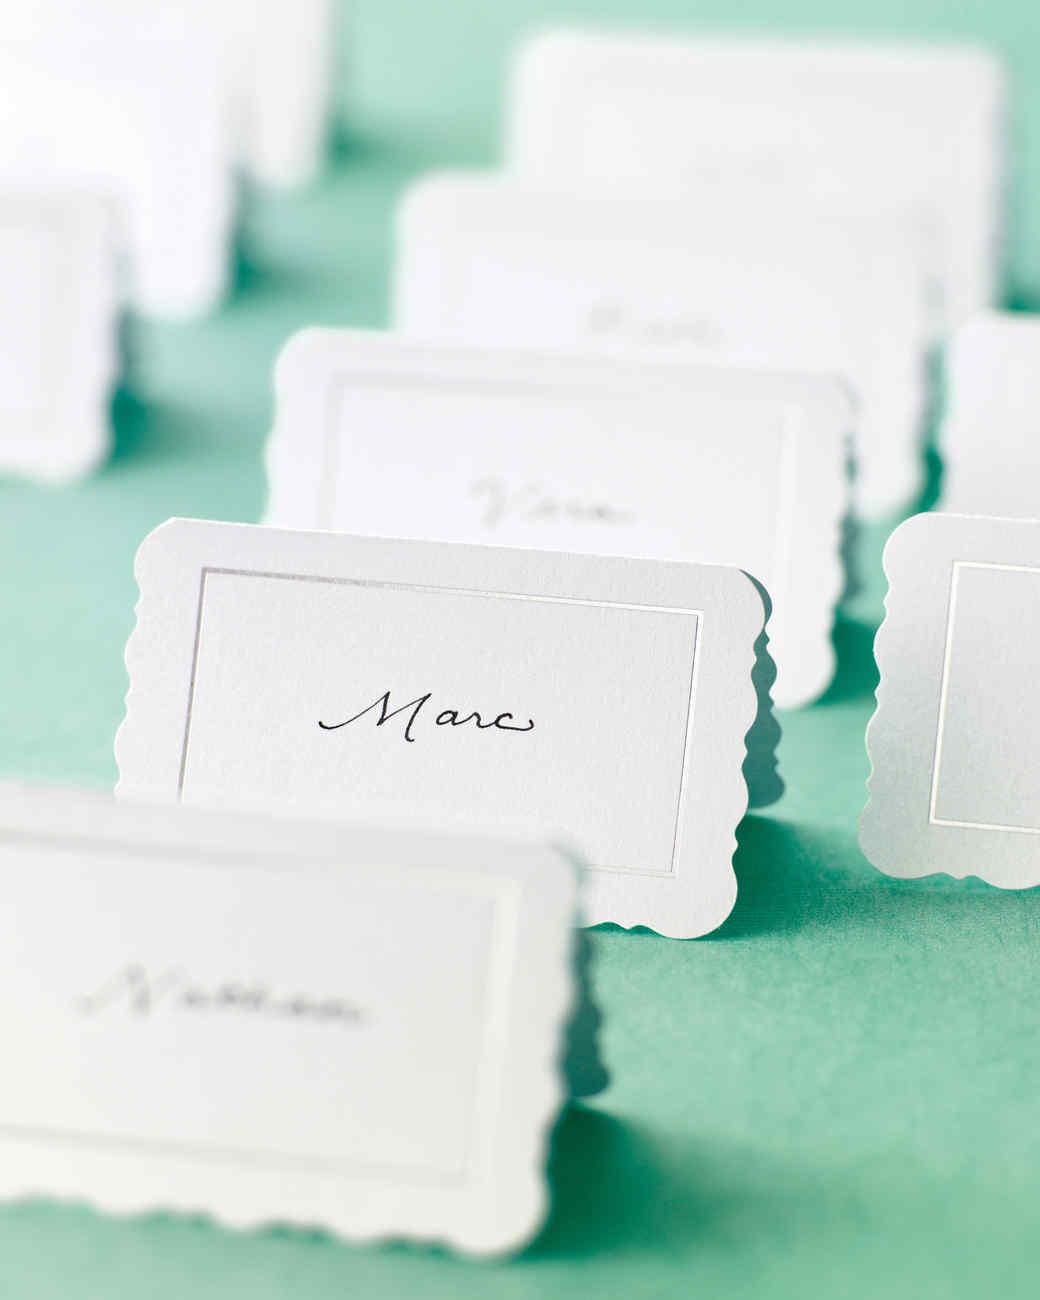 mscrafts-namecards-mrkt-0514.jpg